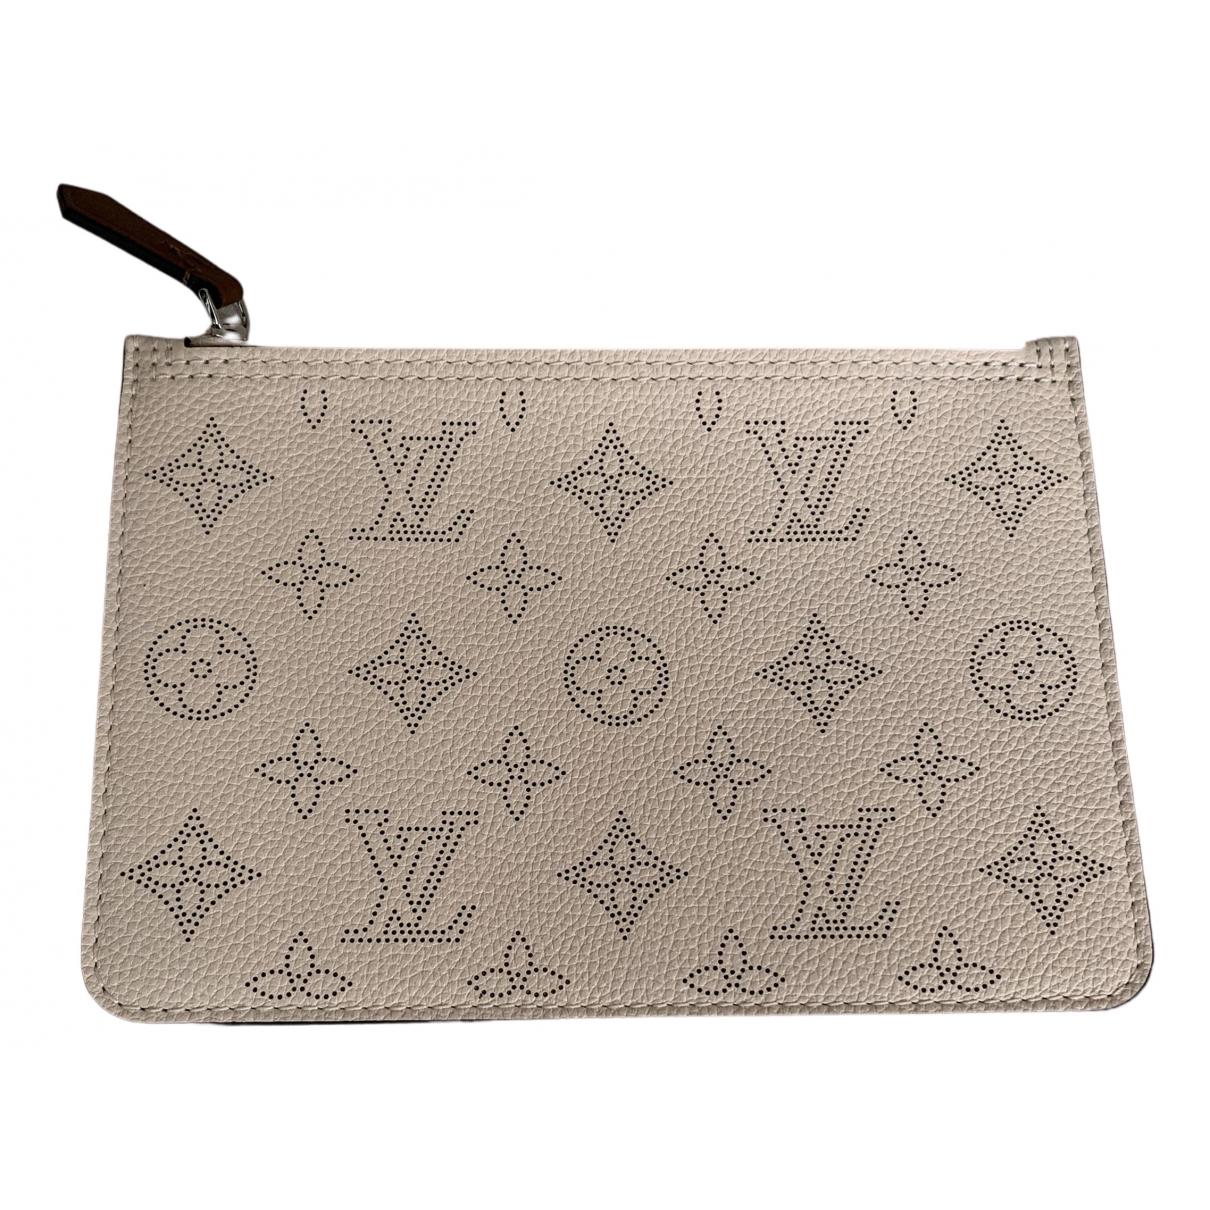 Pochette Mahina de Cuero Louis Vuitton